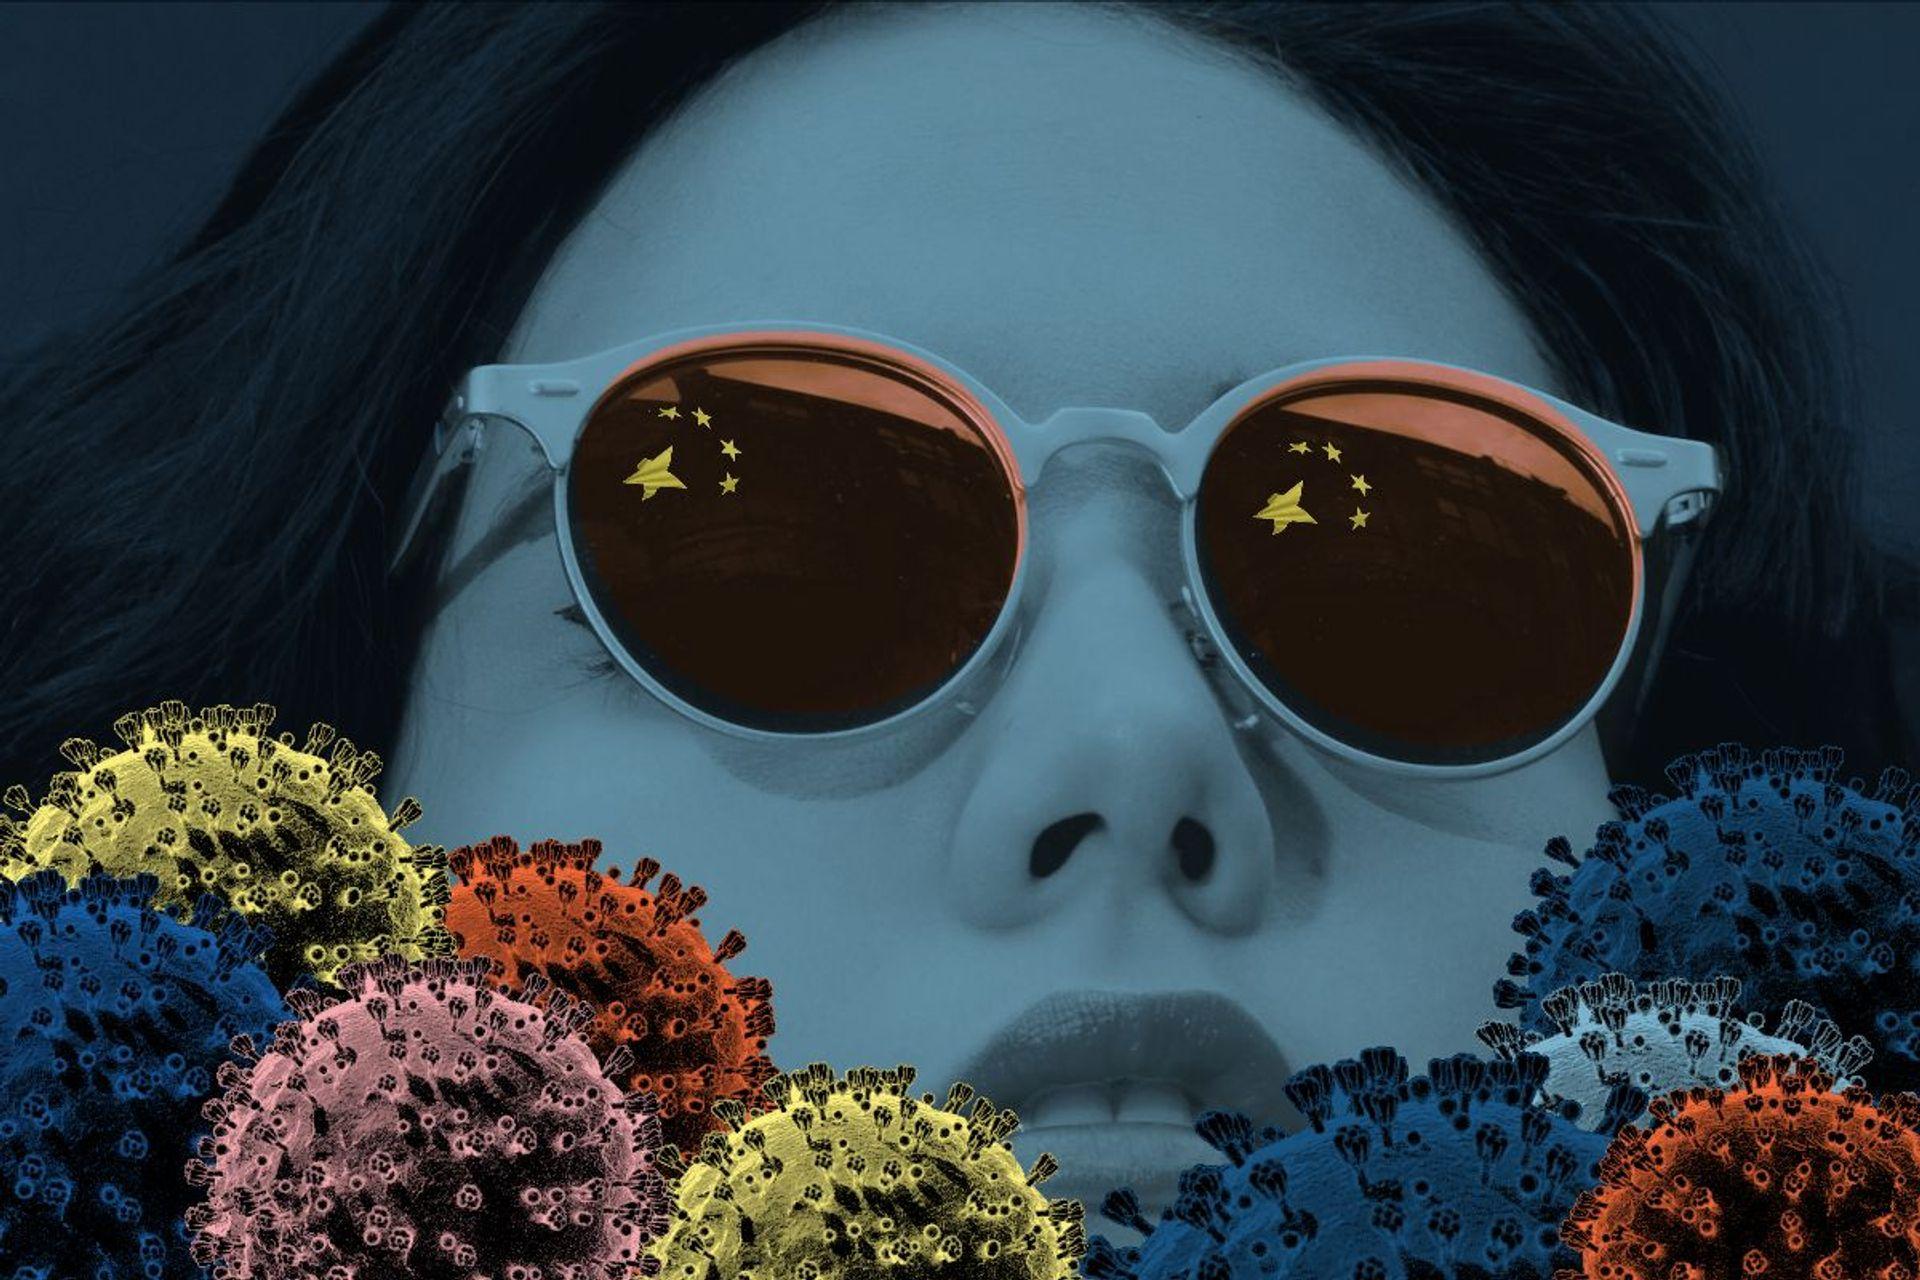 The Asian auction market has surged during the pandemic Illustration: Katherine Hardy / Photo:Alex Sheldon